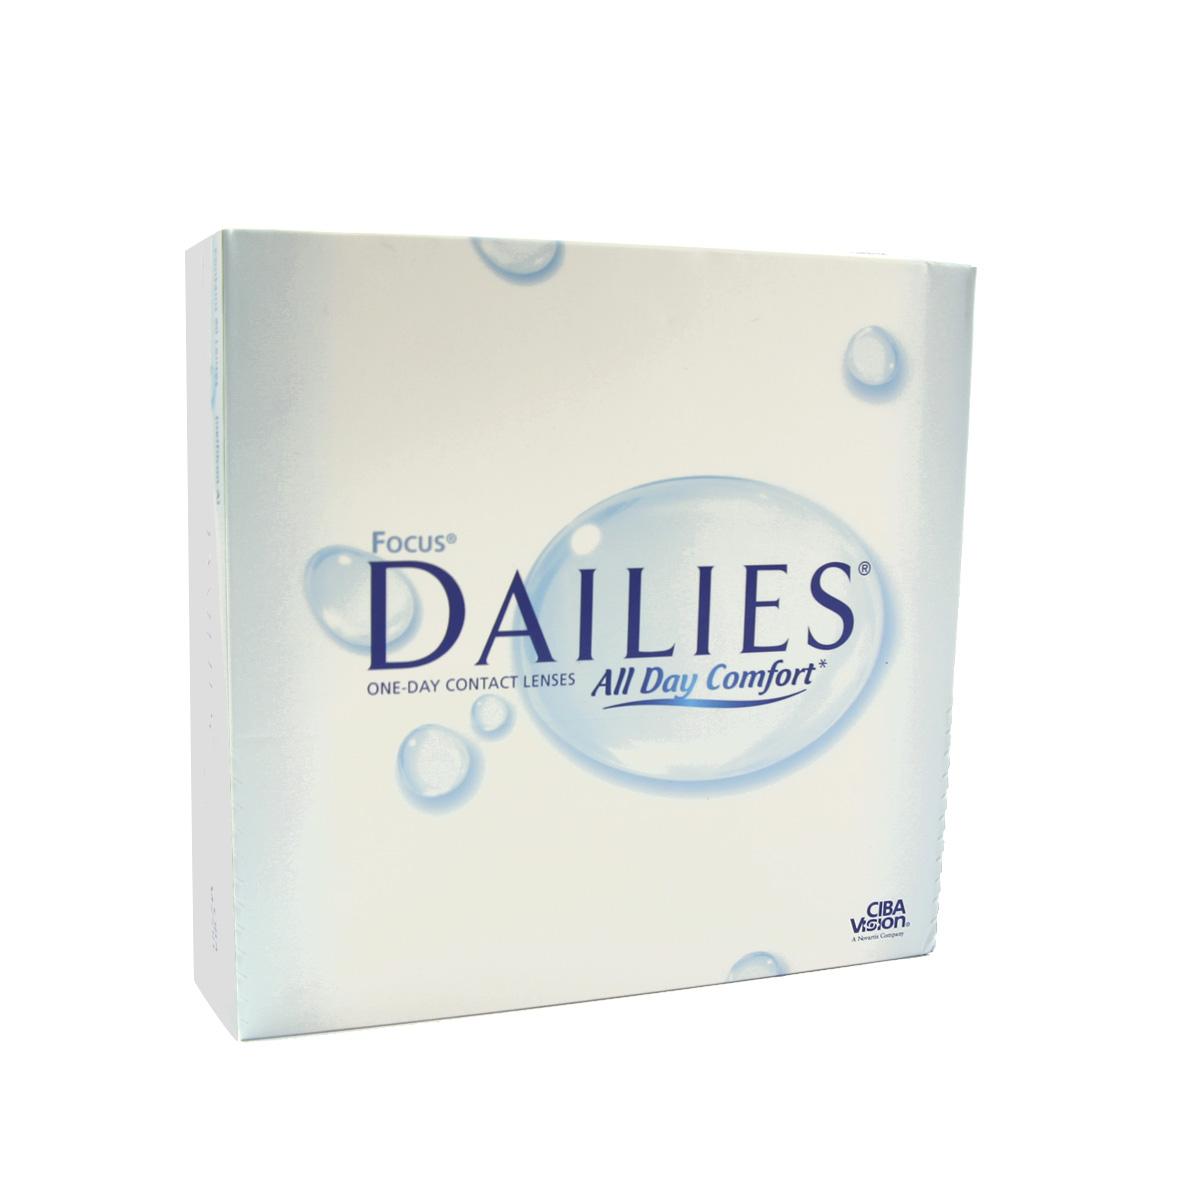 Lenstore Focus Dailies All Day Comfort (90 lenses)